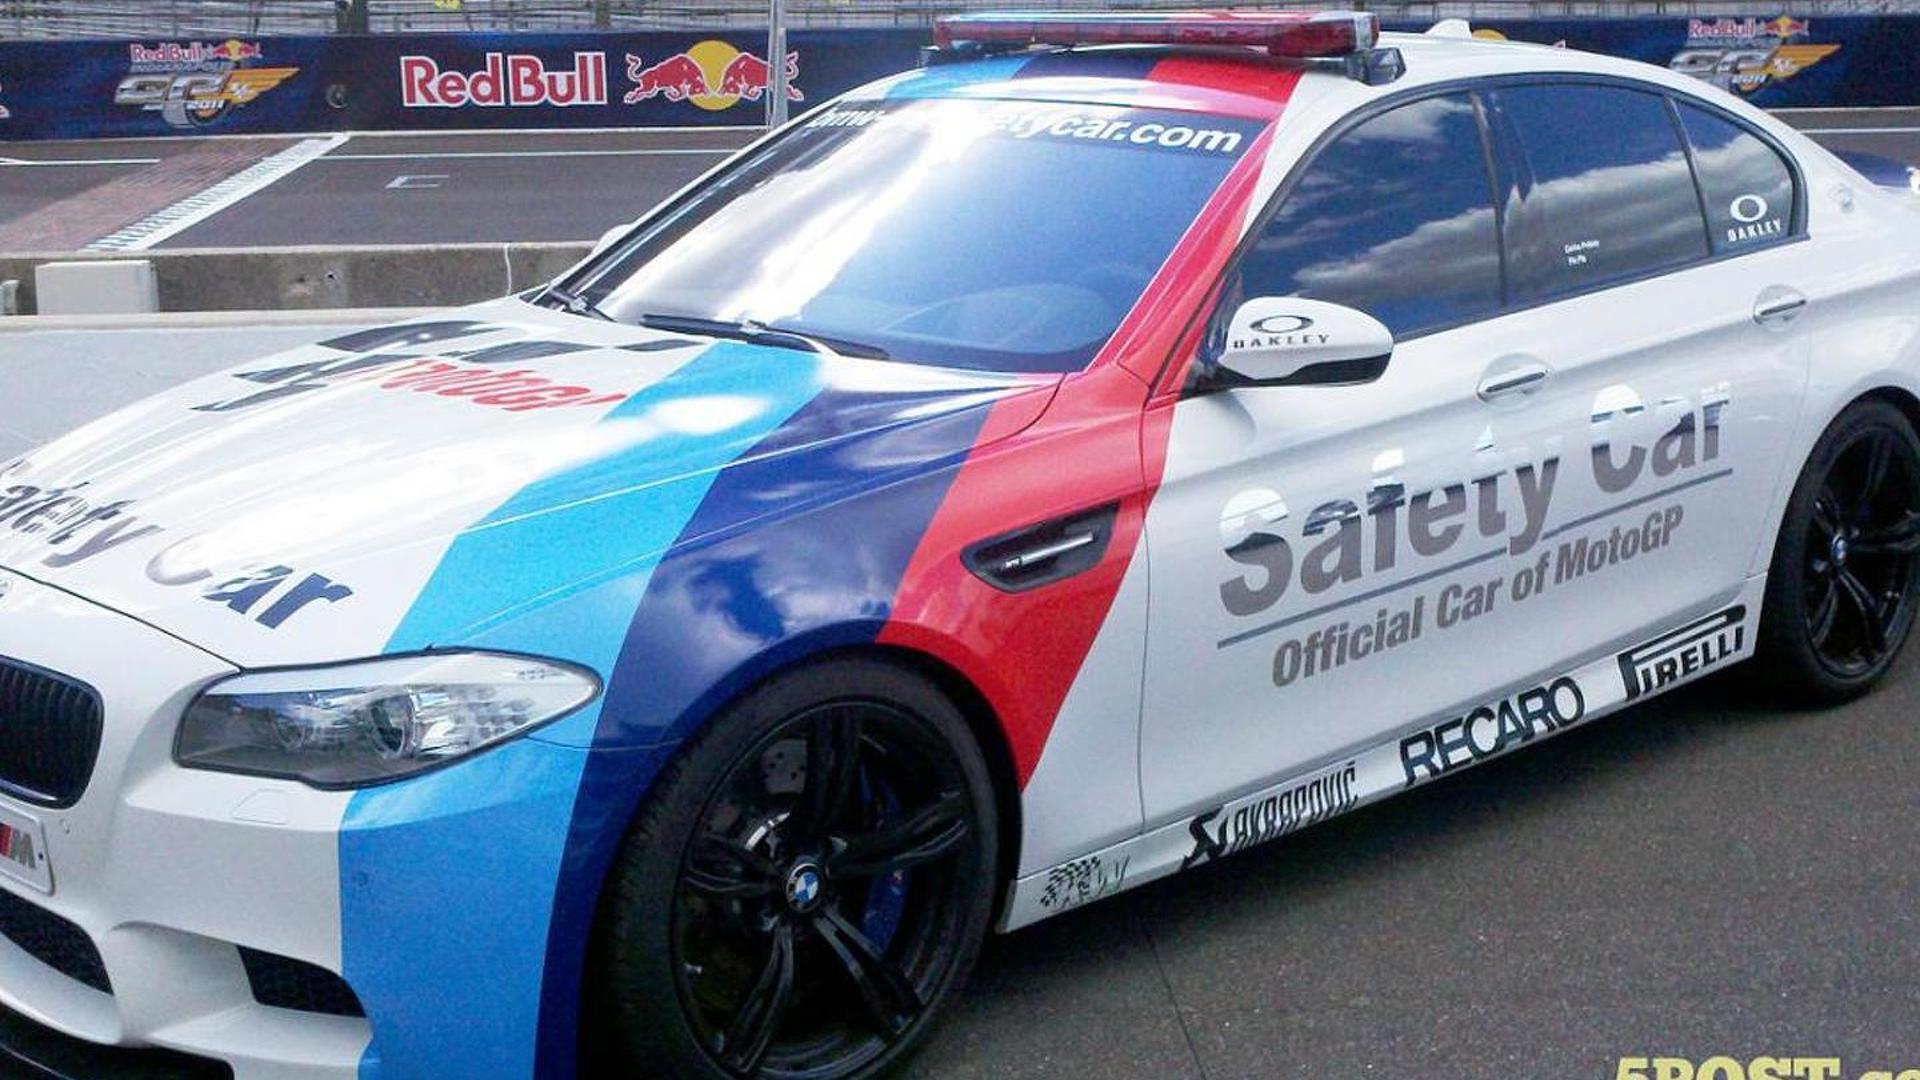 BMW M5 safety car unveiled